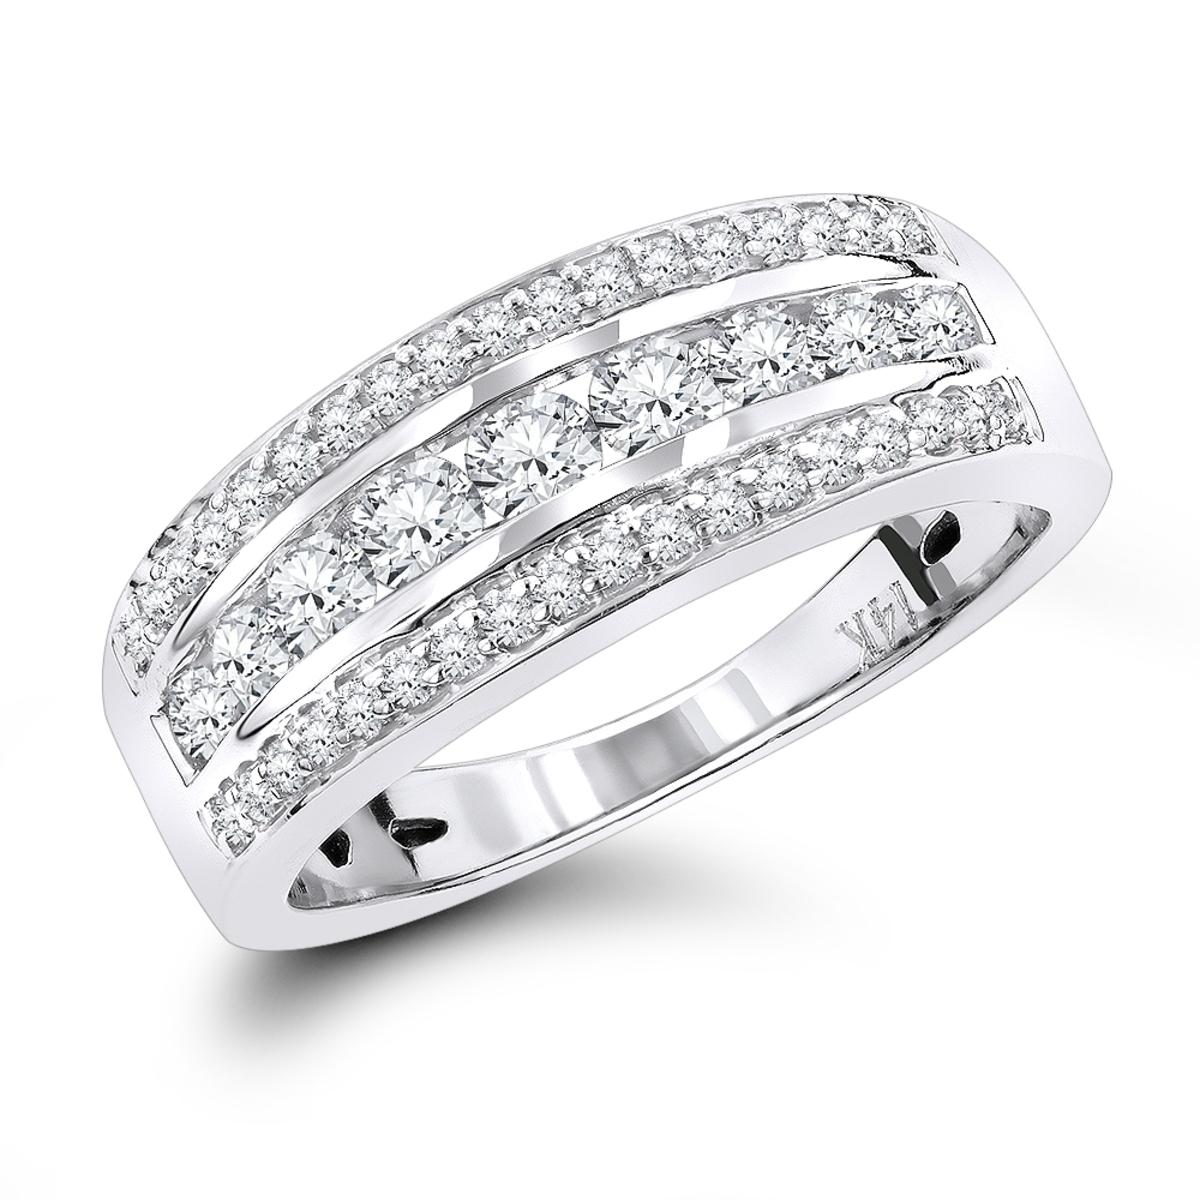 14K Gold 3 Row Ladies Diamond Wedding Band 0.55ct